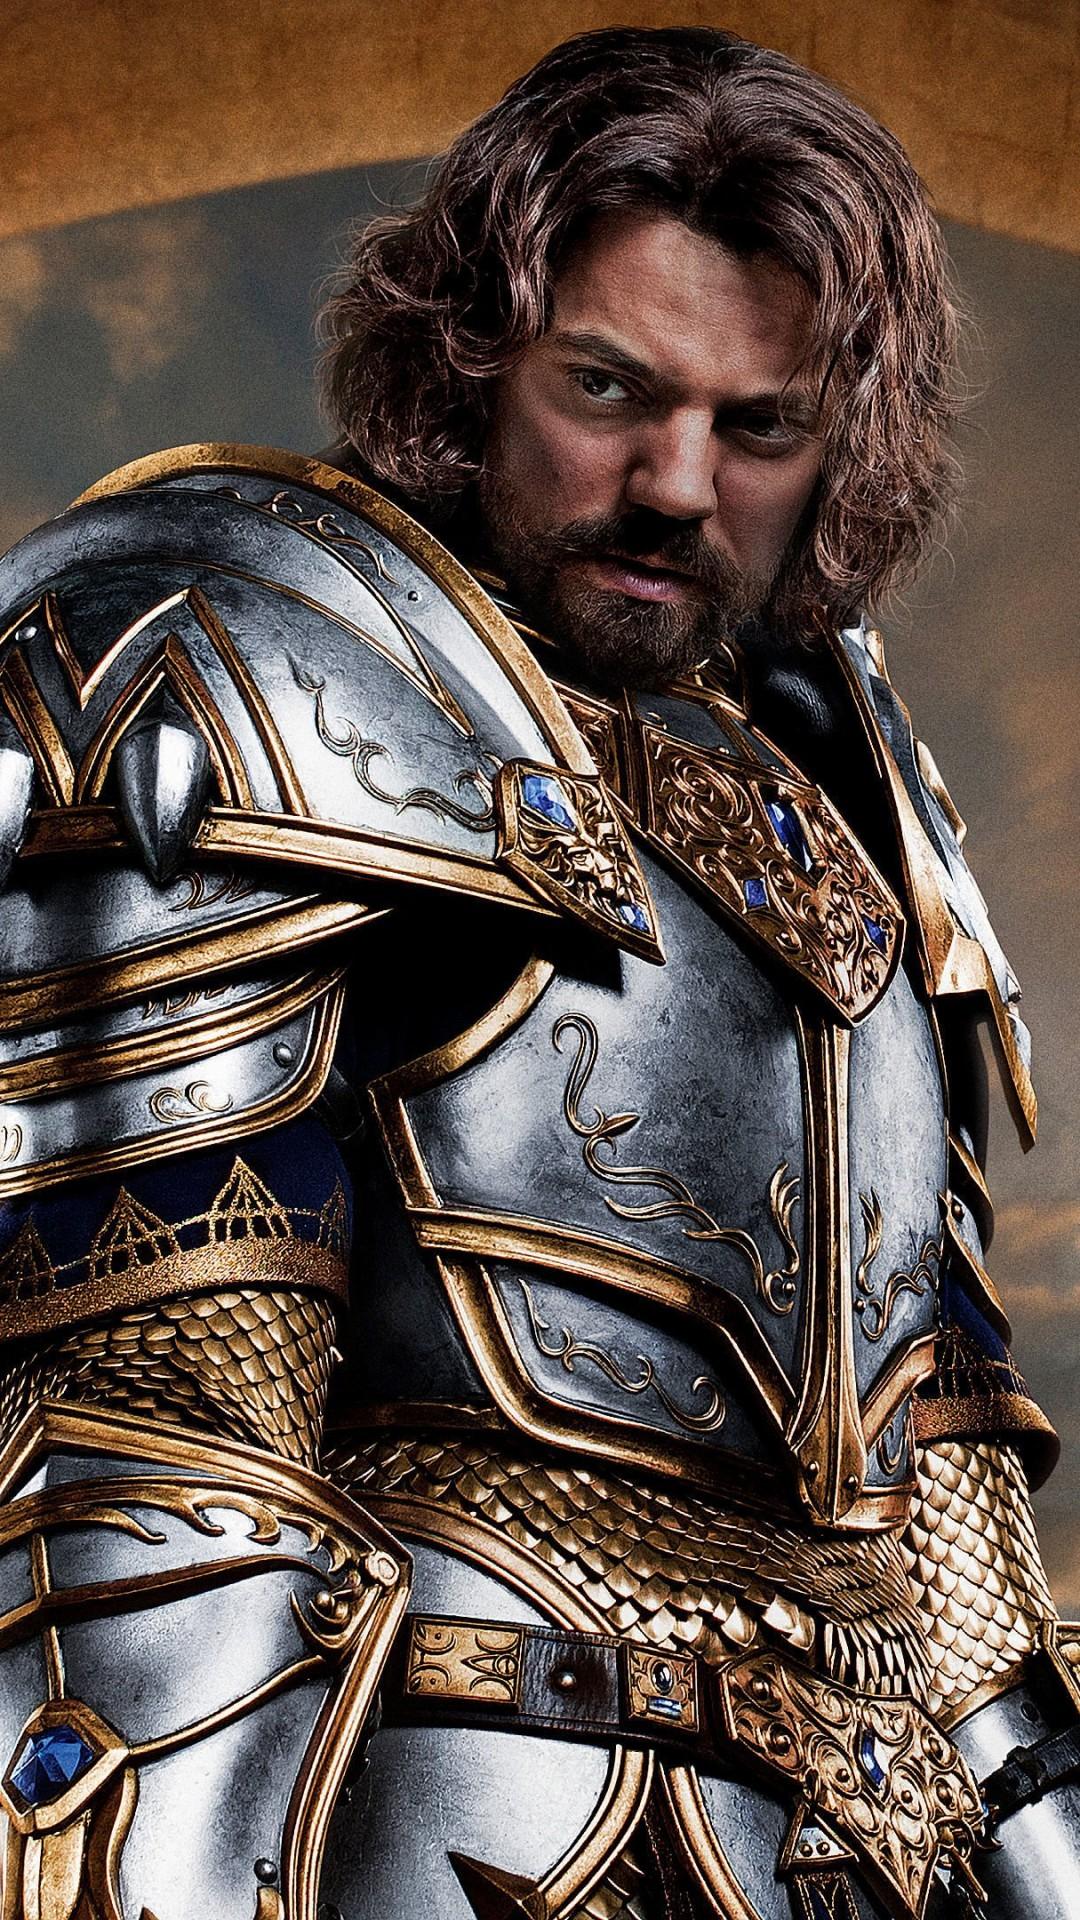 Wallpaper Warcraft, Dominic Cooper, King Llane Wrynn, Best ...